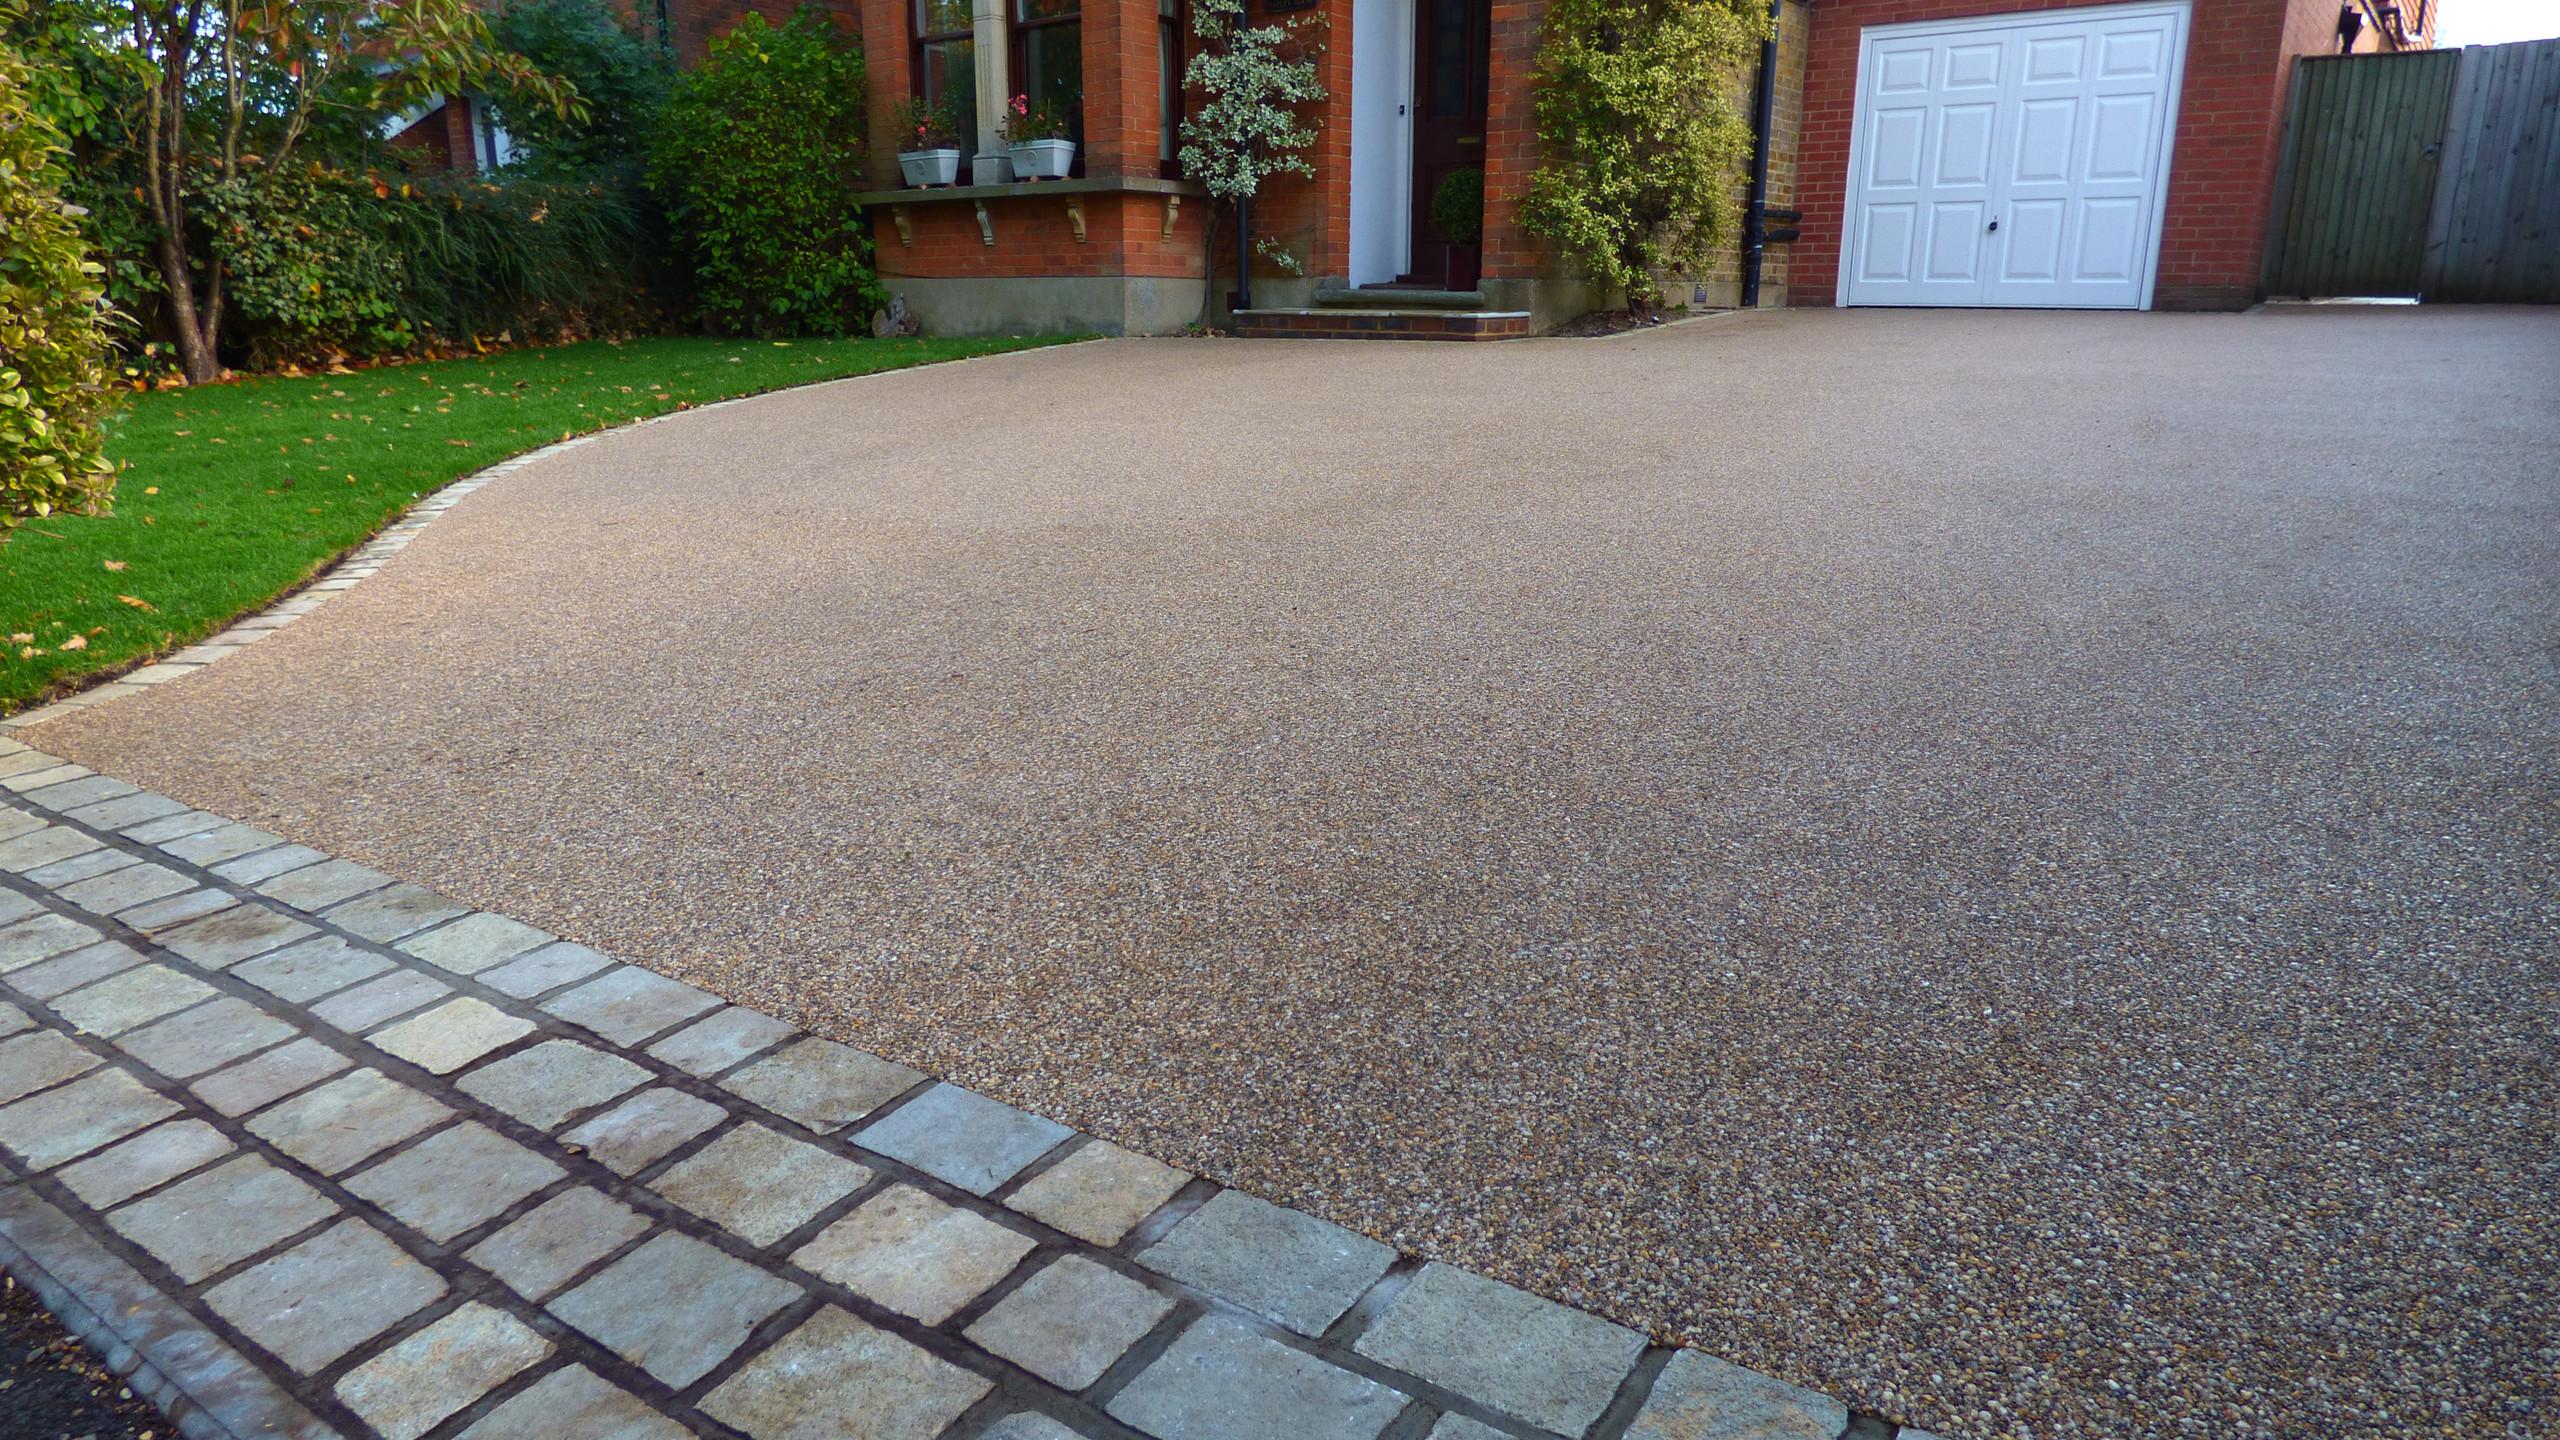 Resin Bound Driveway with granite sett apron